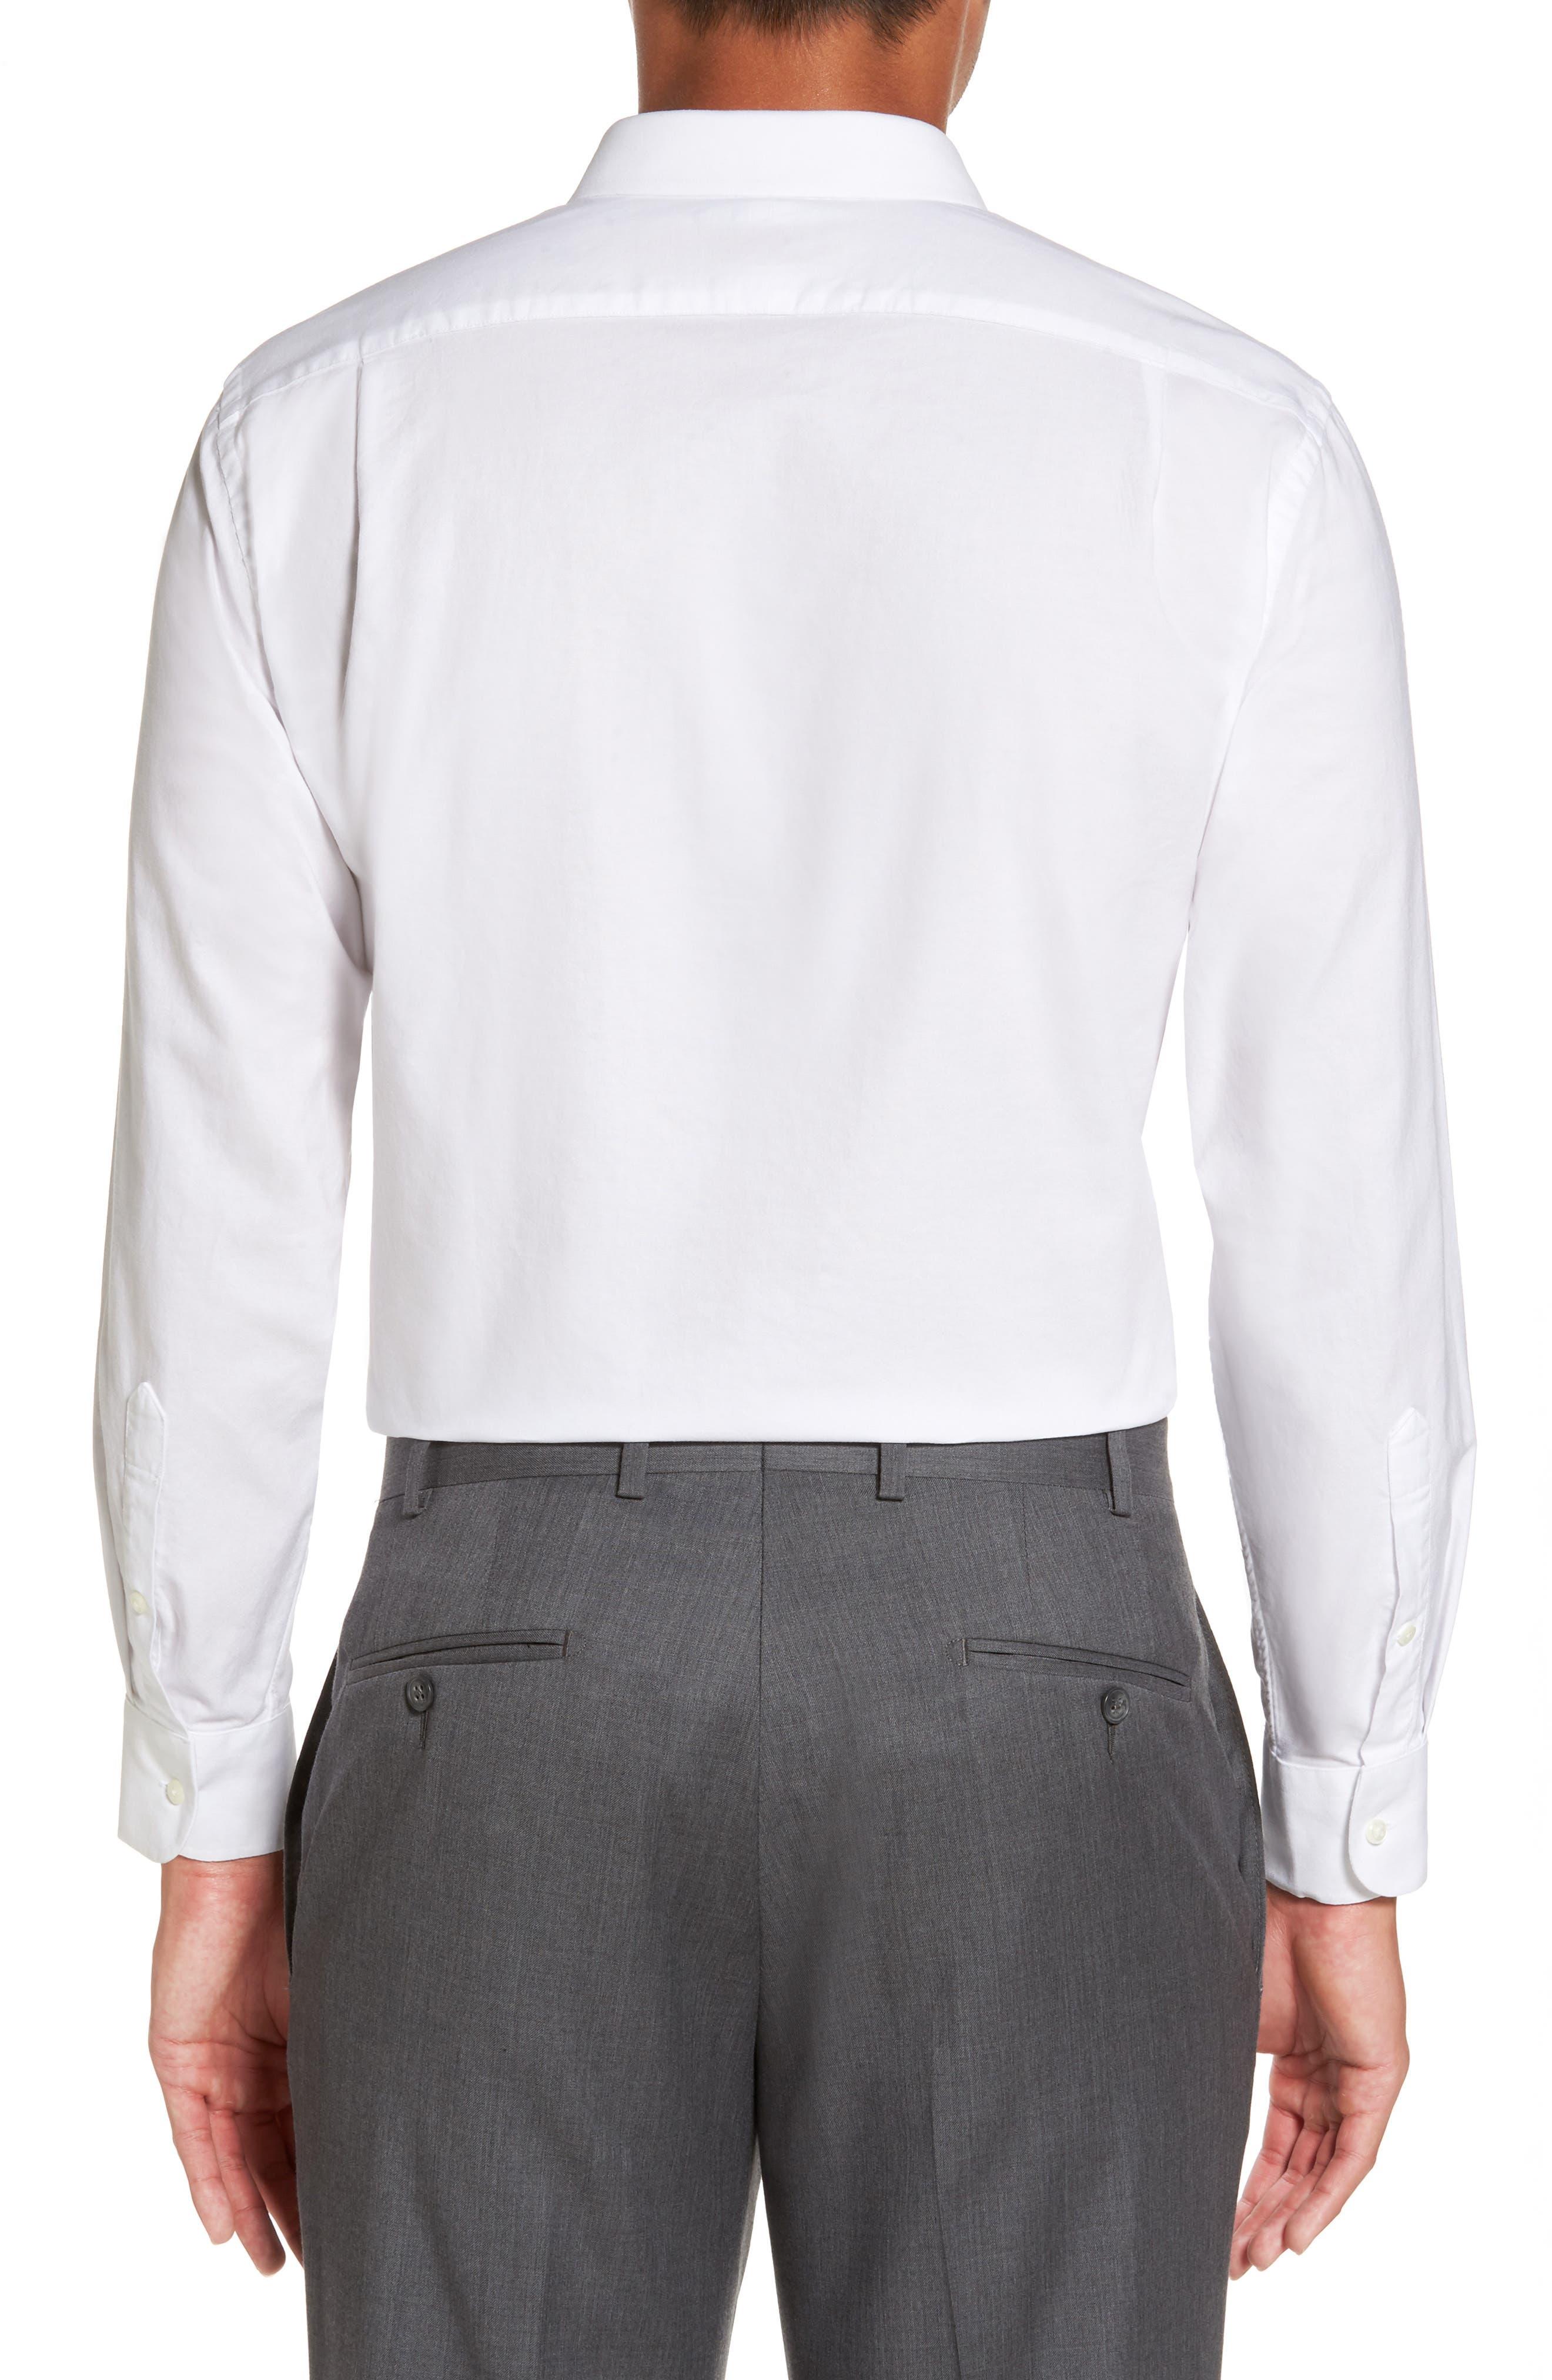 Trim Fit Solid Oxford Dress Shirt,                             Alternate thumbnail 2, color,                             100